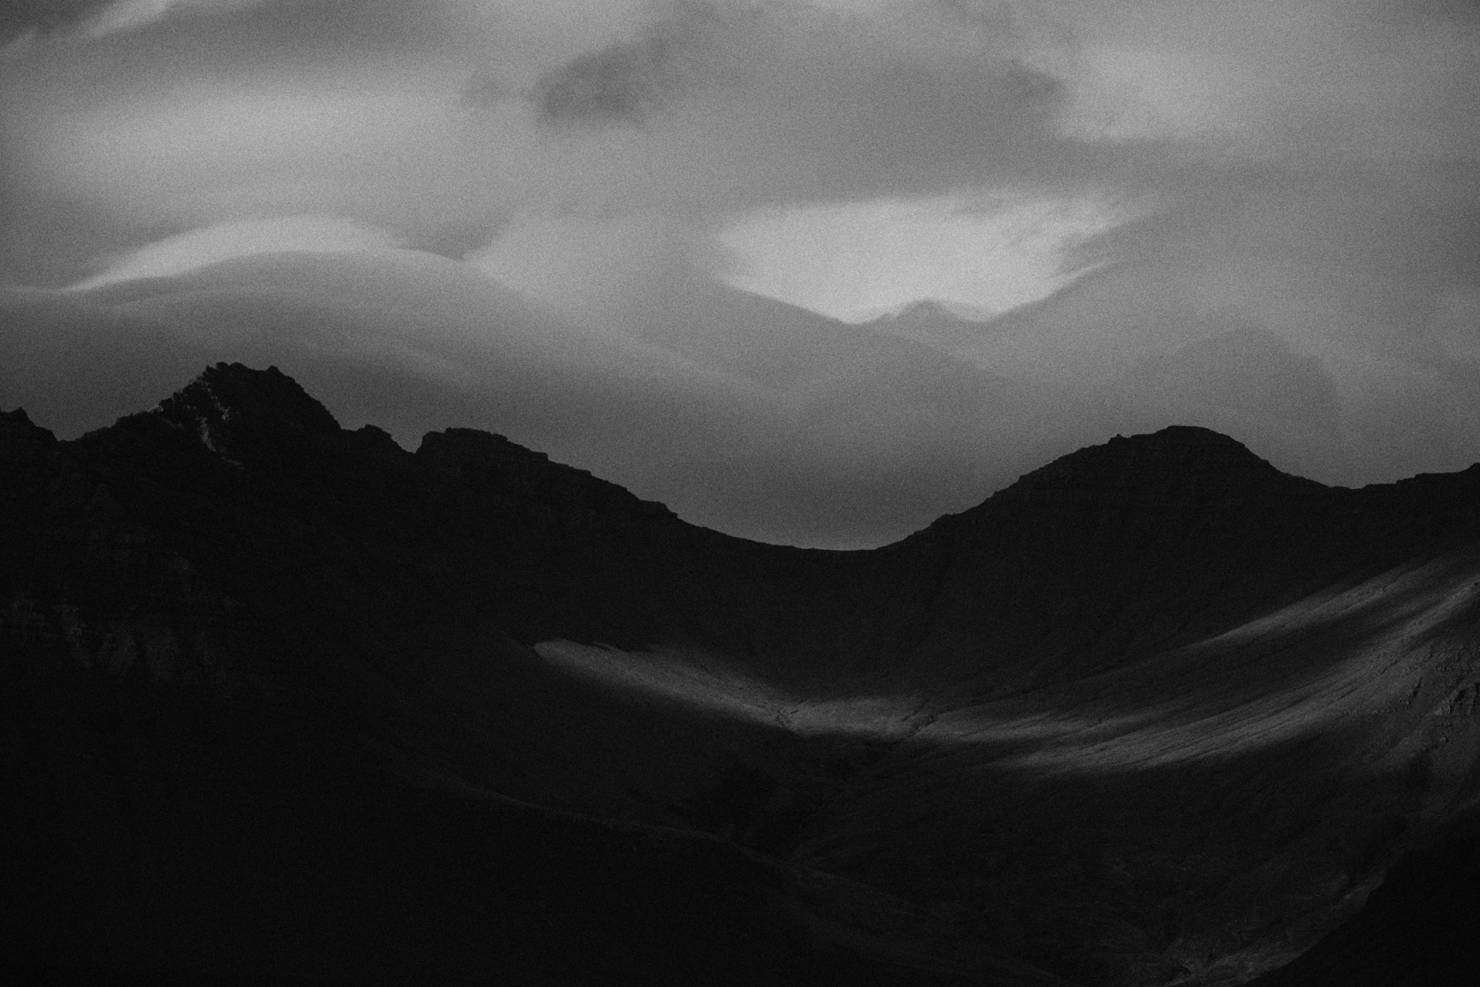 patrick_schuttler_landscape_iceland_011-0d97c421e491096cf3f97a9fb50f4dfe